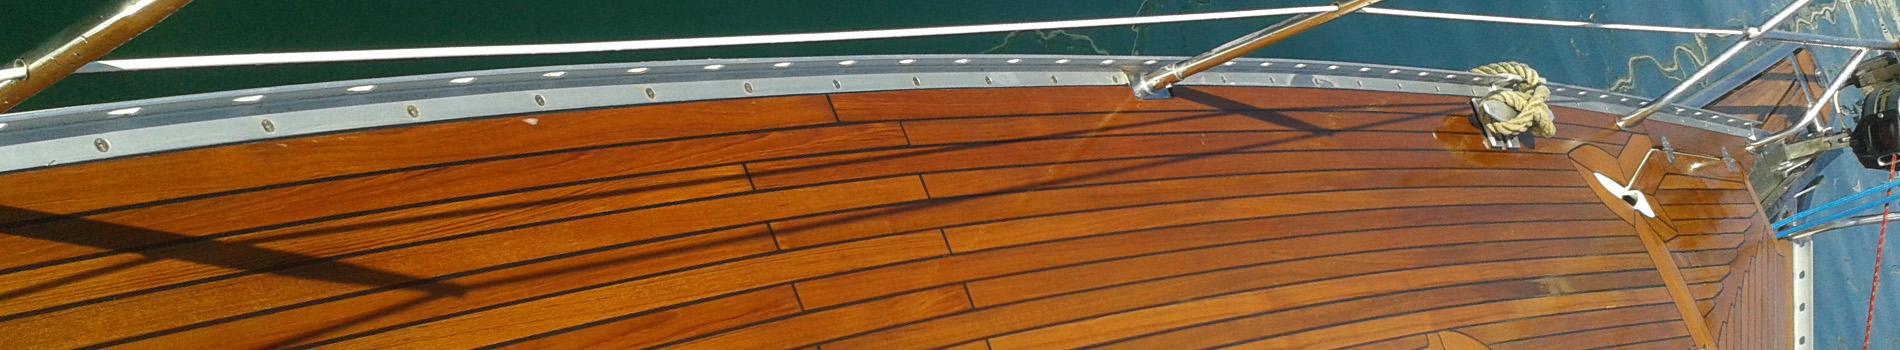 teak-deck-2